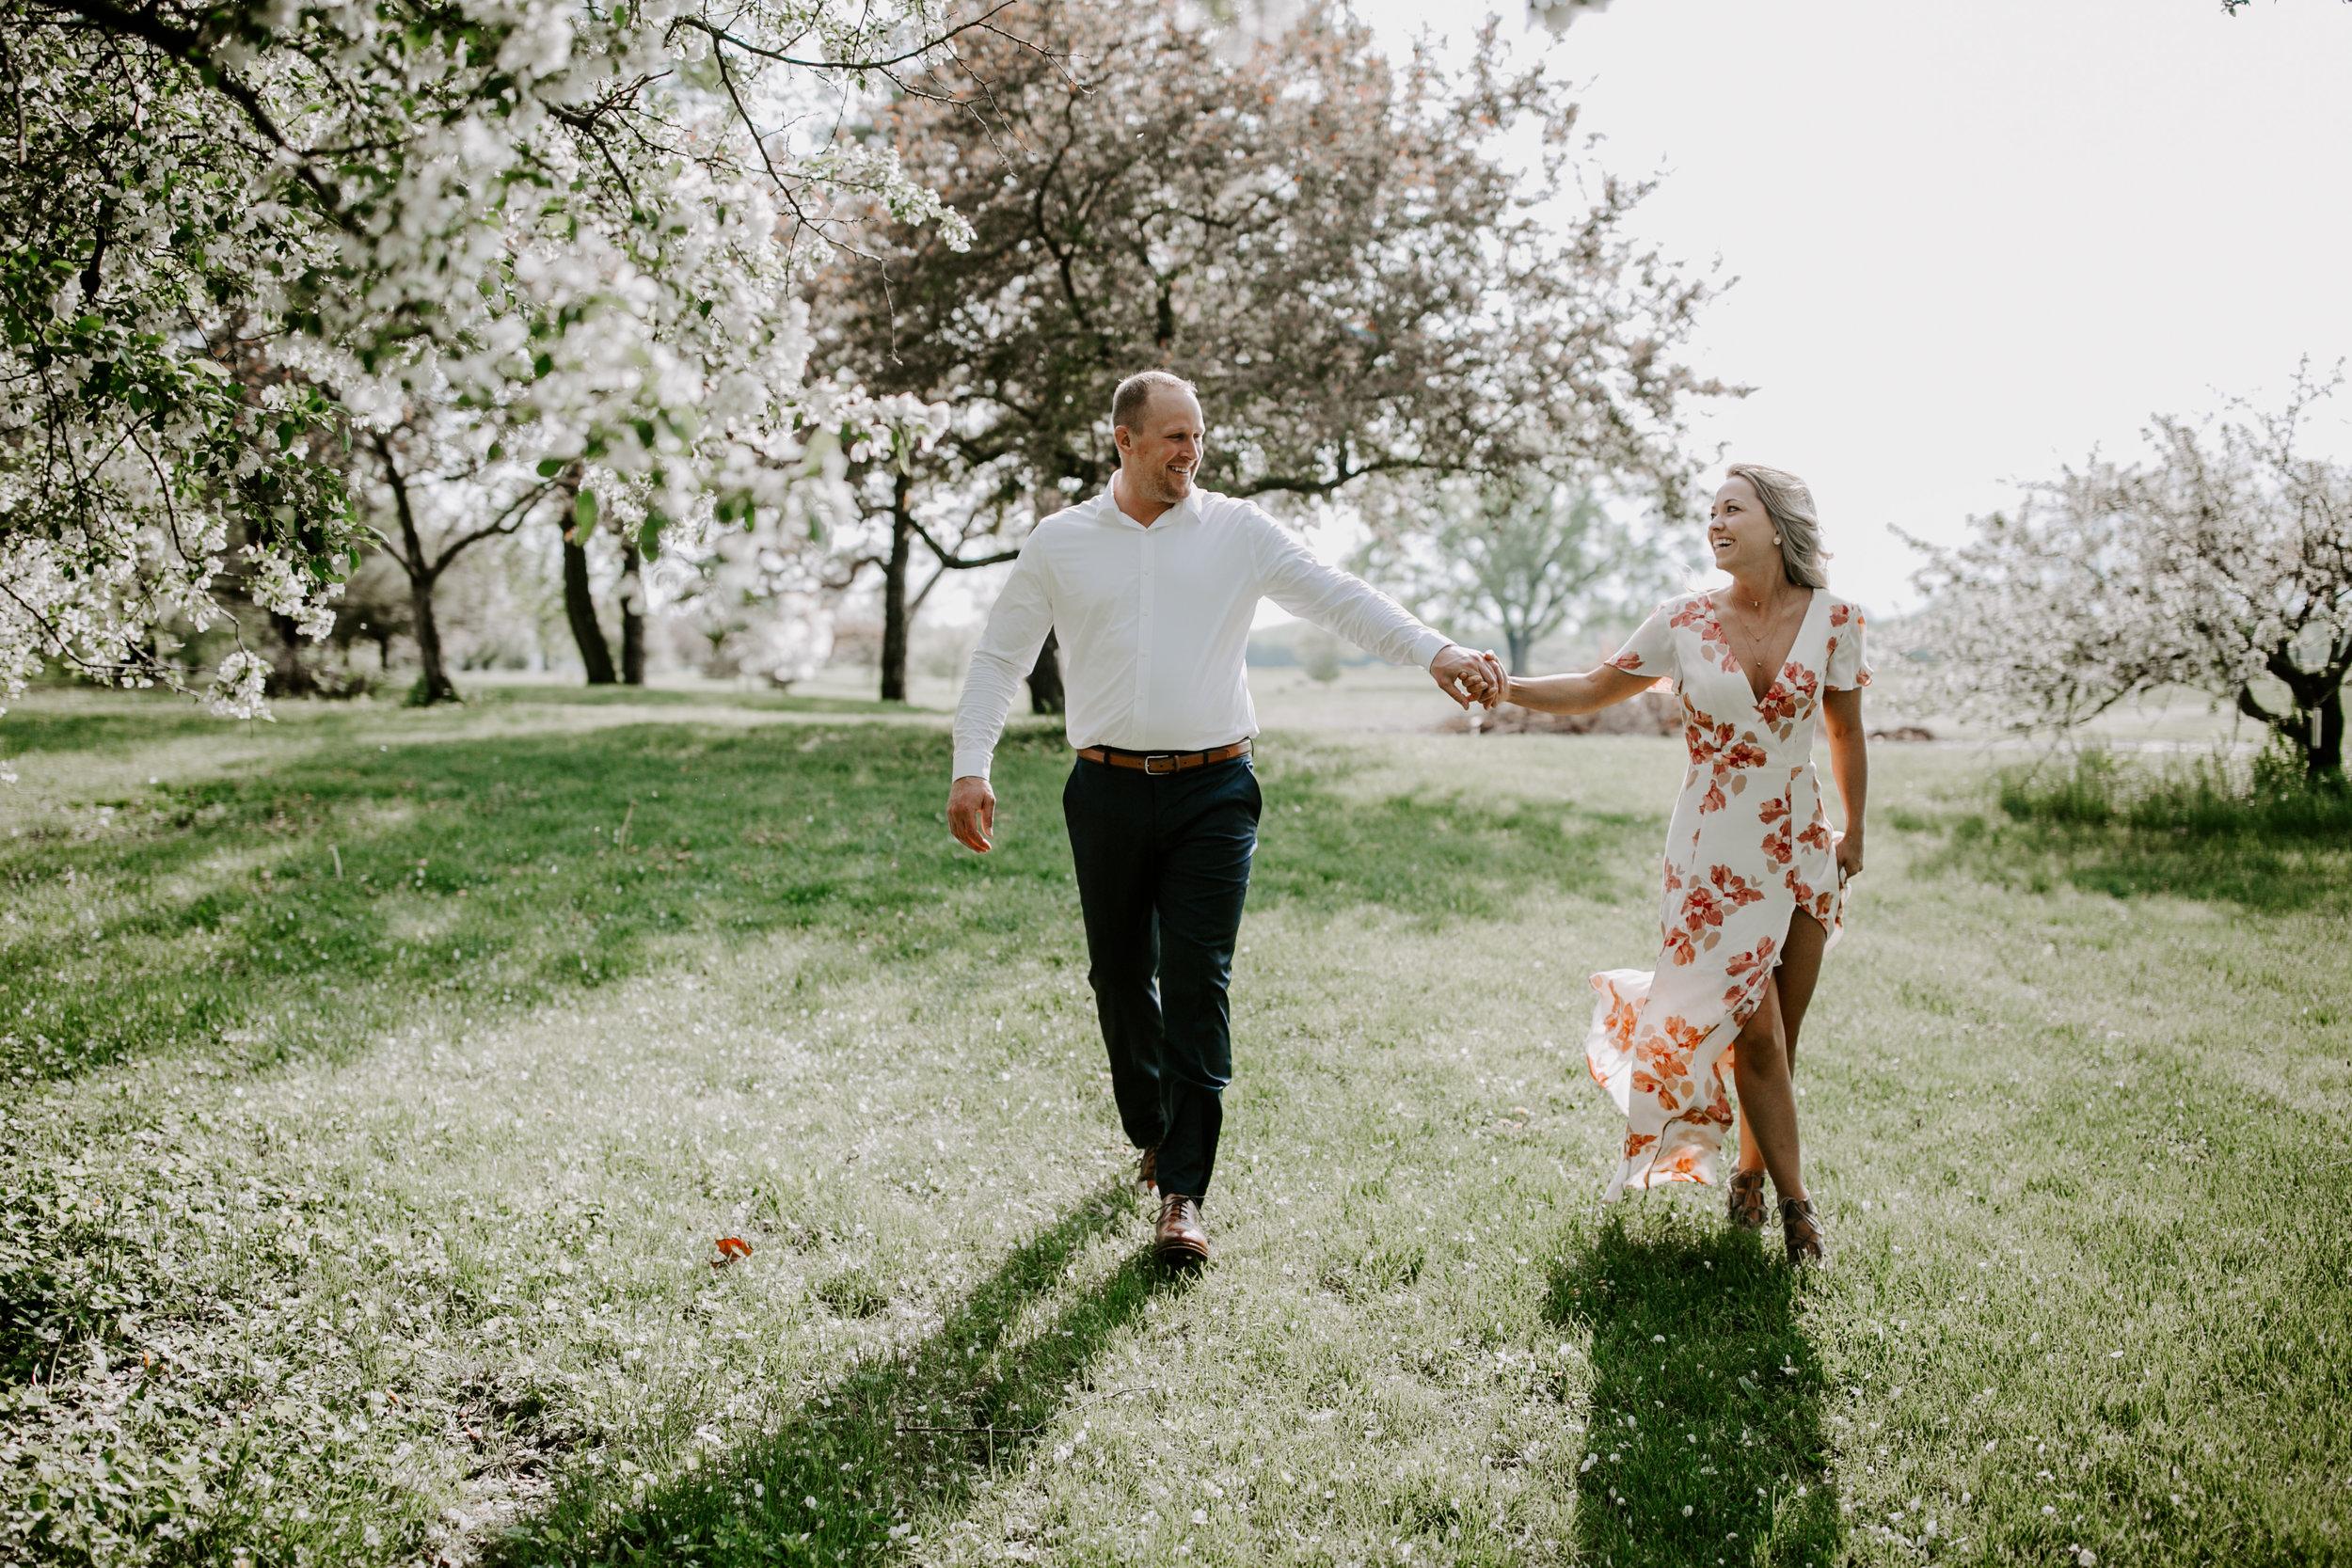 gracetphotography-wedding-photographer-adventure-bride-engagement-midwest-6.jpg